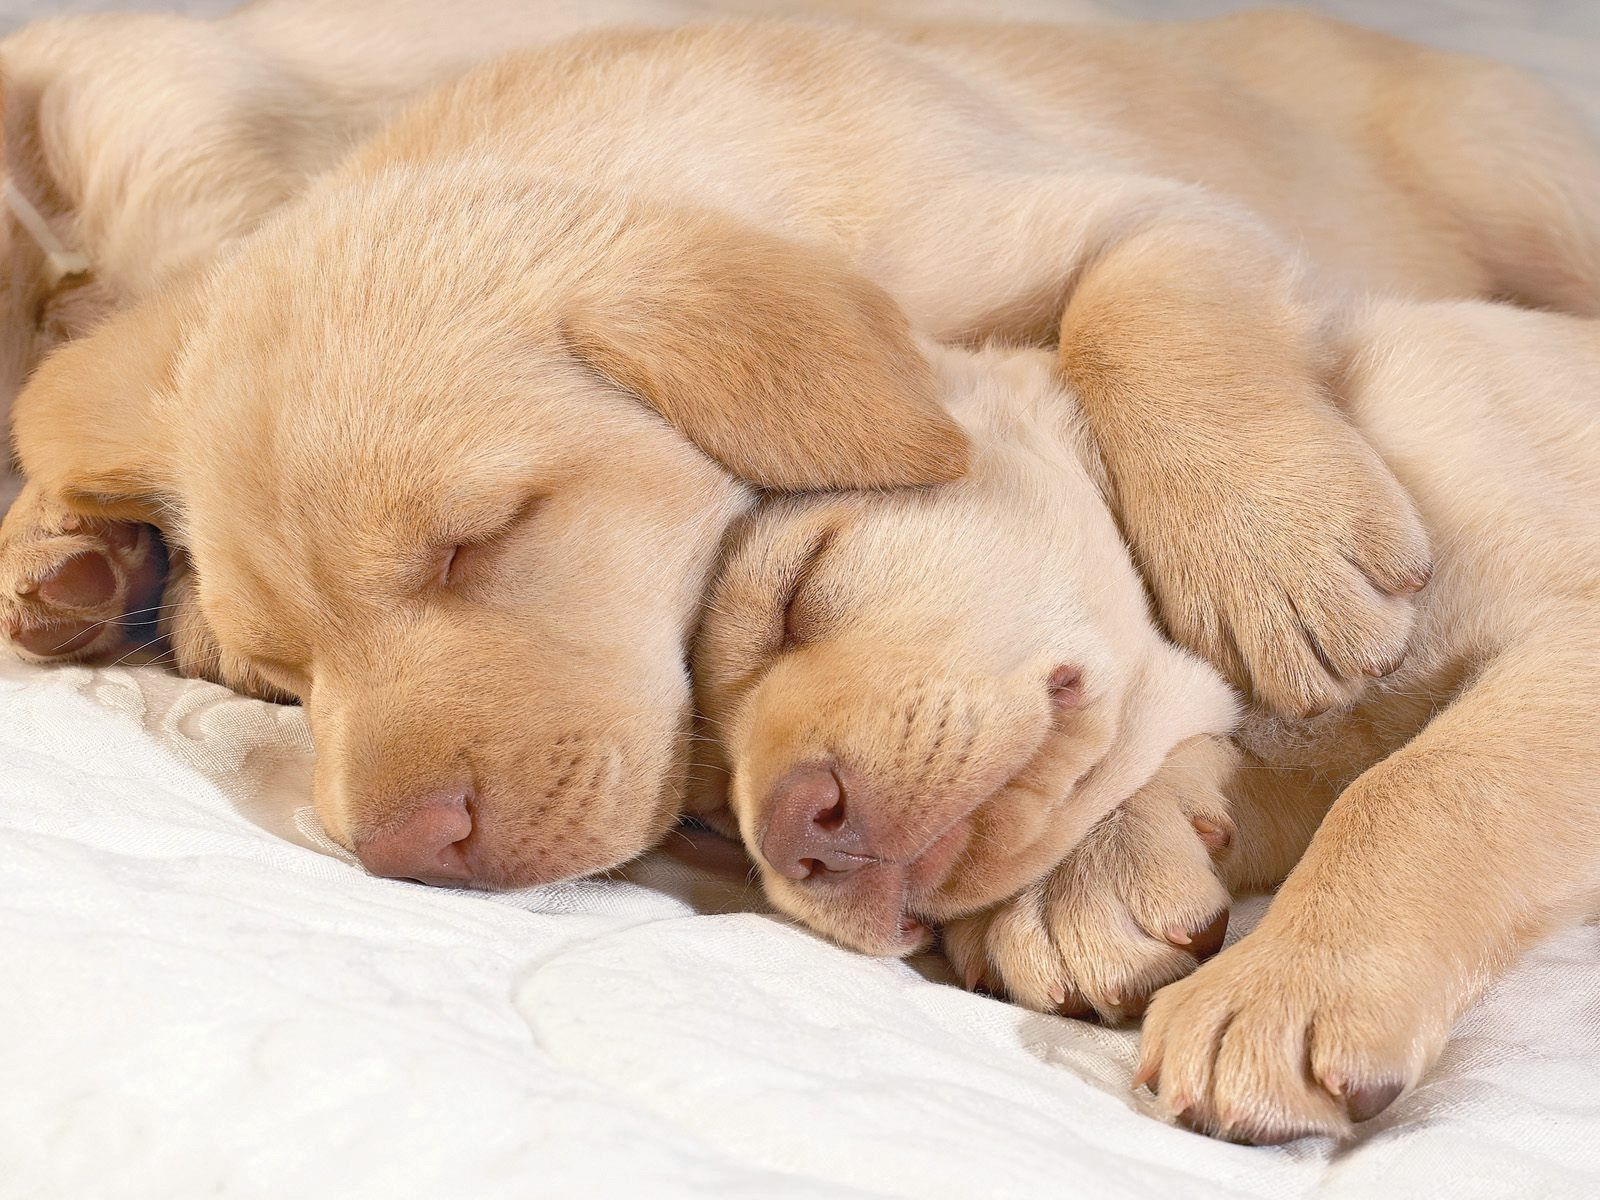 My Dogs Sleeping Puppies Sleeping Dogs Animal Hugs